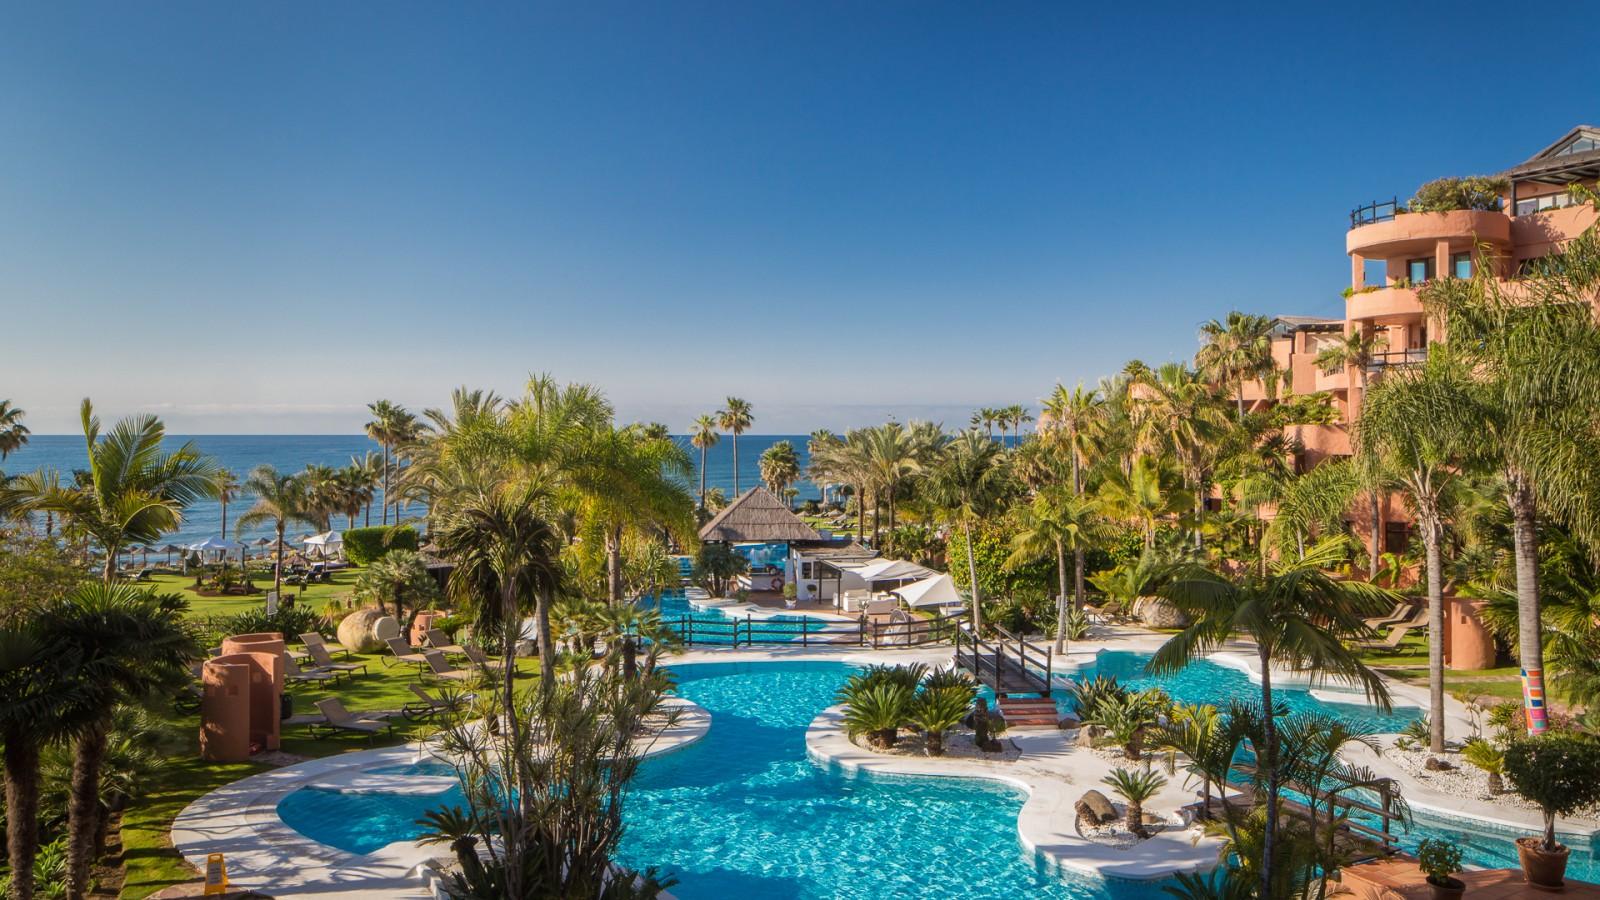 Kempinski Hotel Bahía Pool